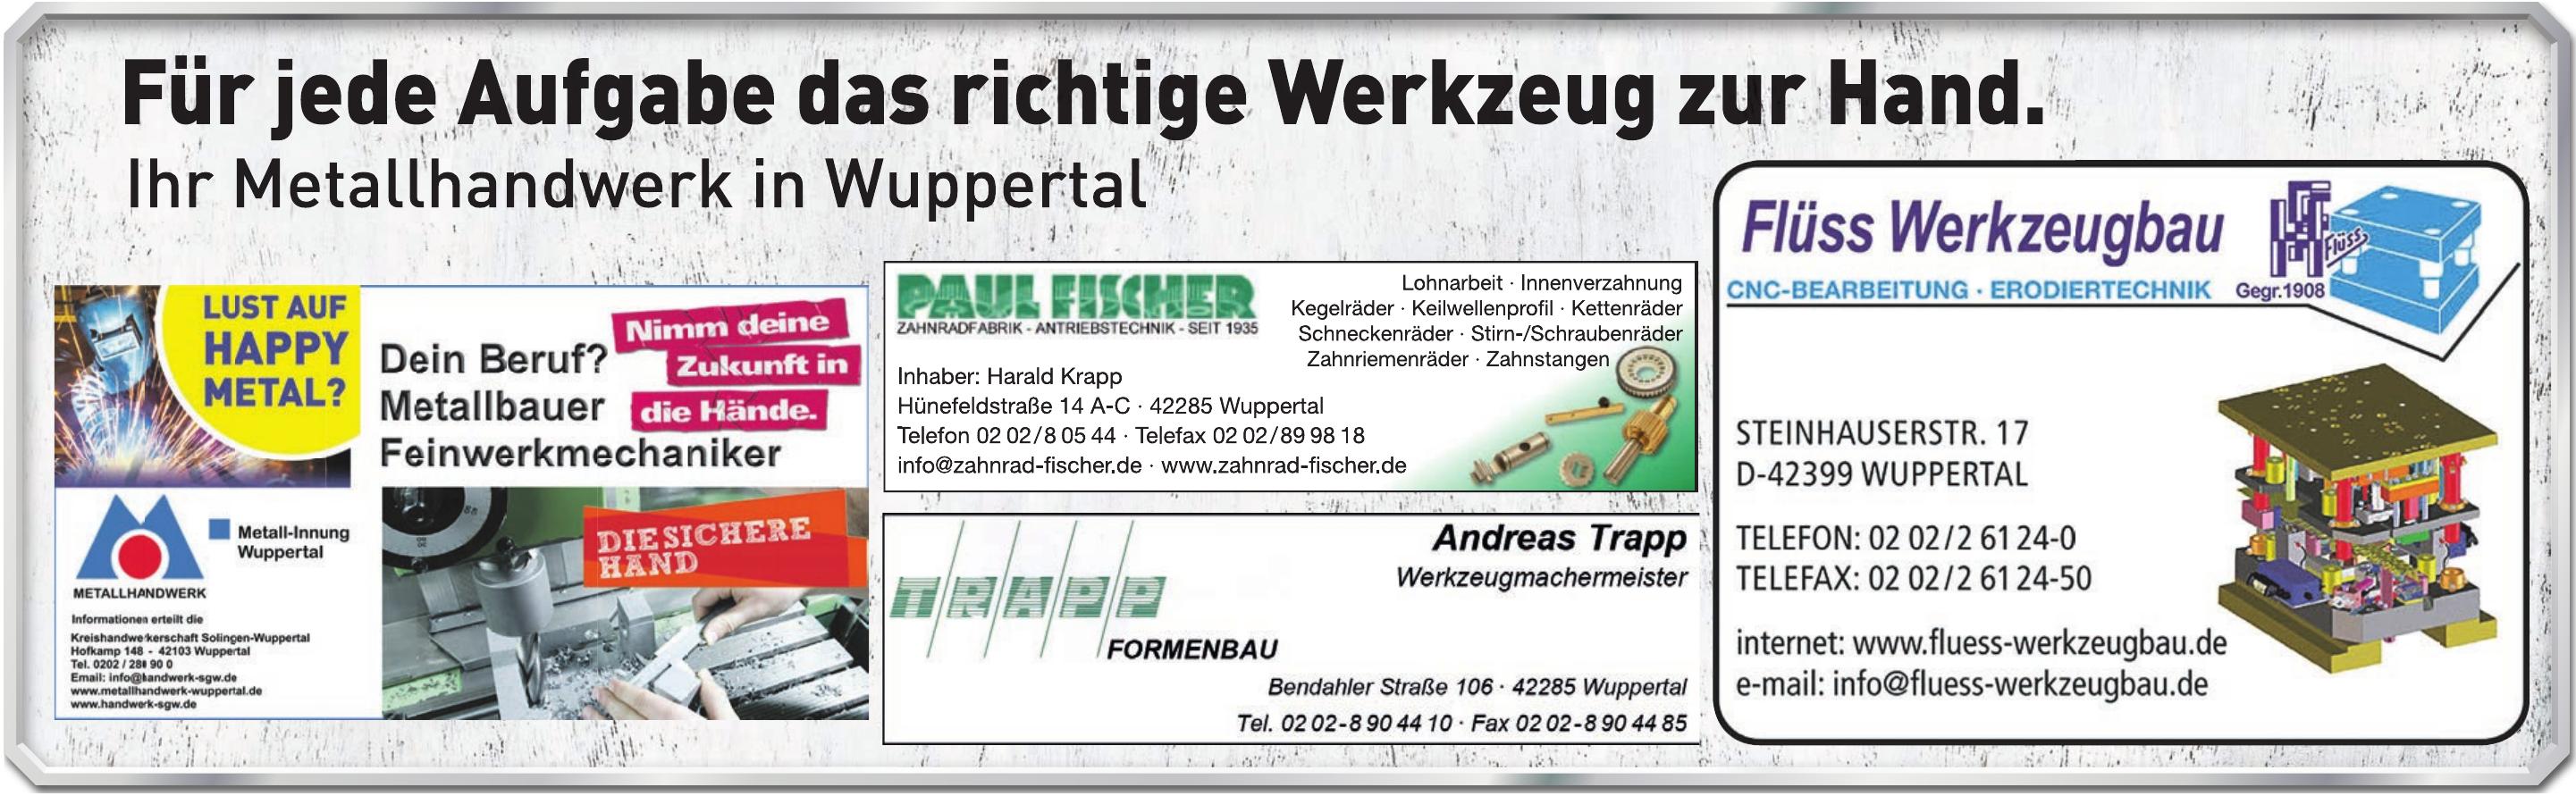 Metallhandwerk in Wuppertal